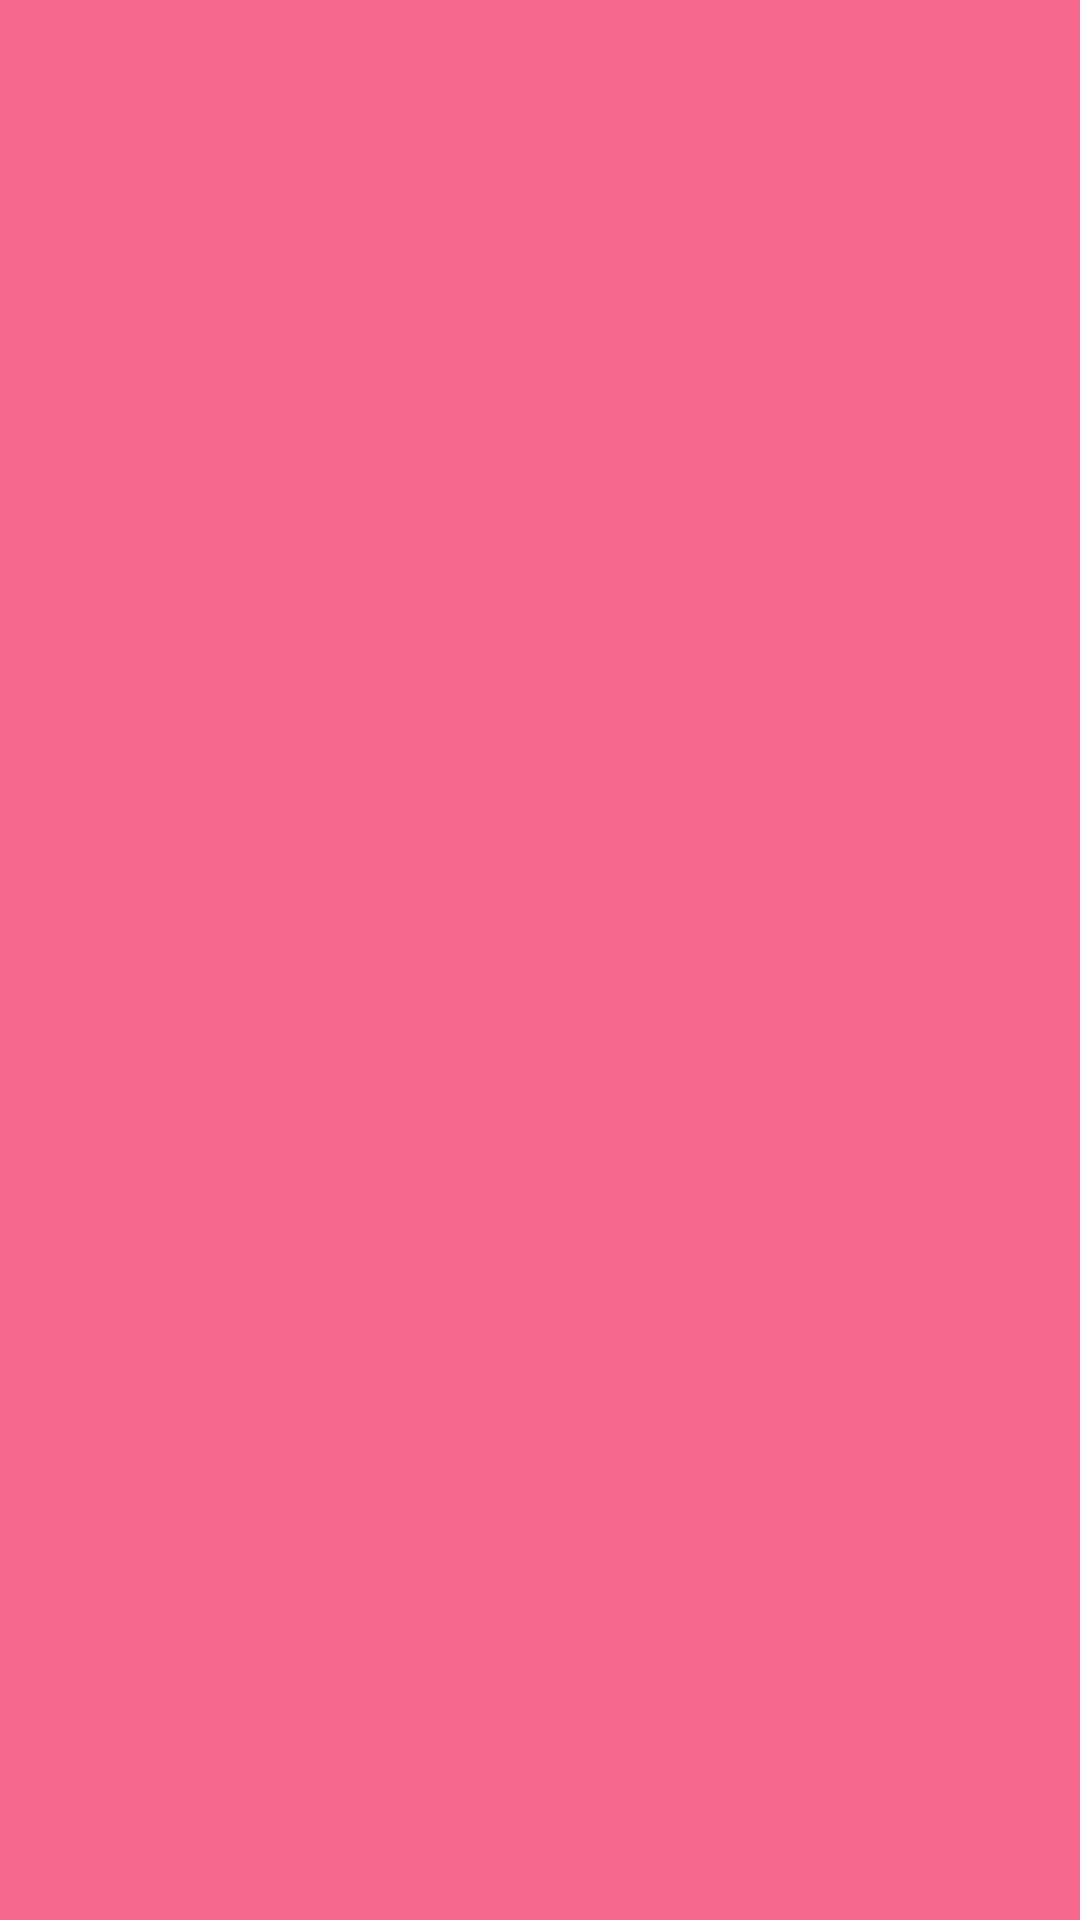 1080x1920 Light Crimson Solid Color Background